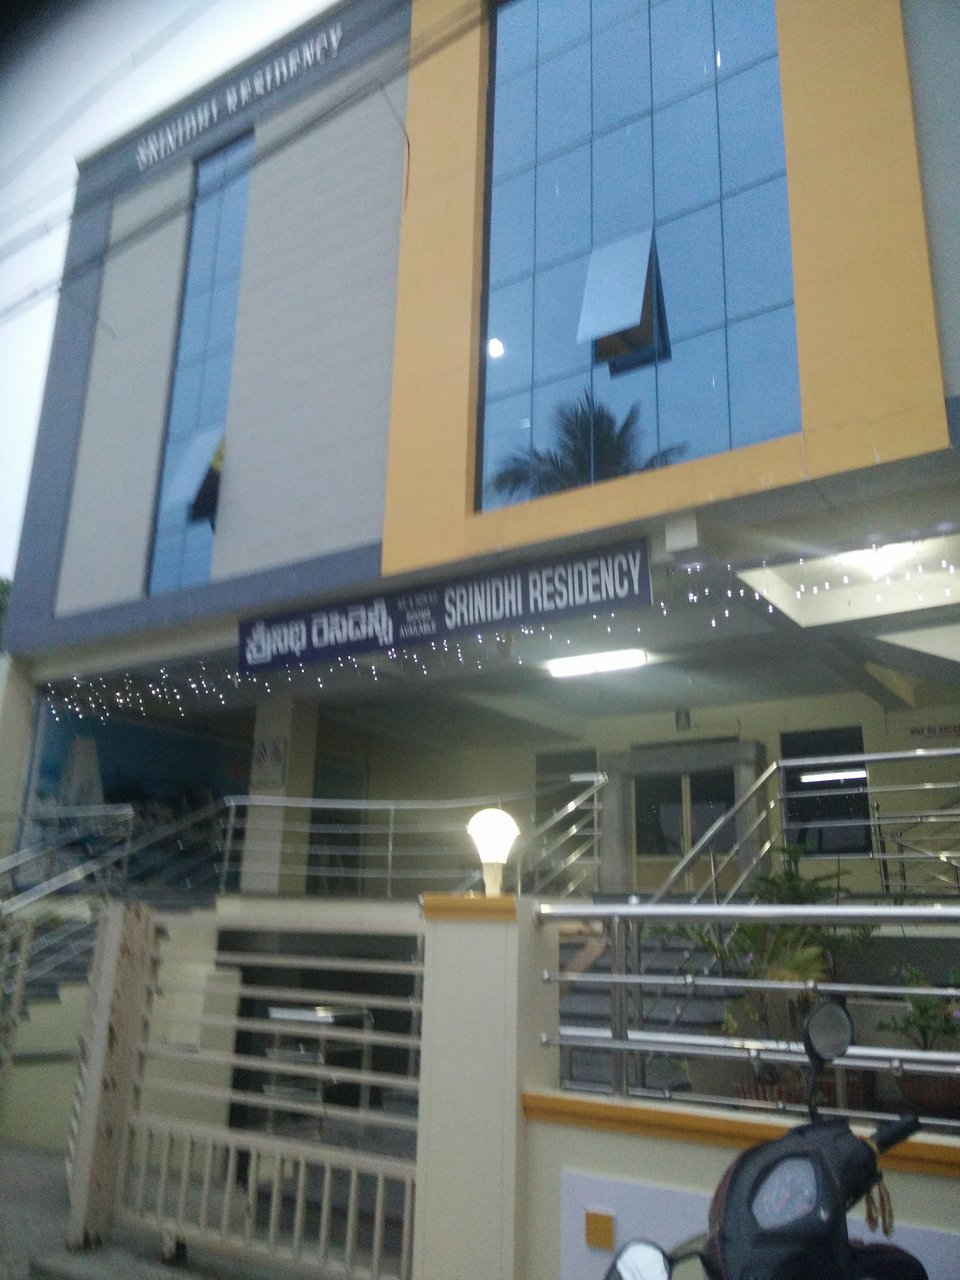 Srinidhi Residency Prices Hotel Reviews Bhadrachalam